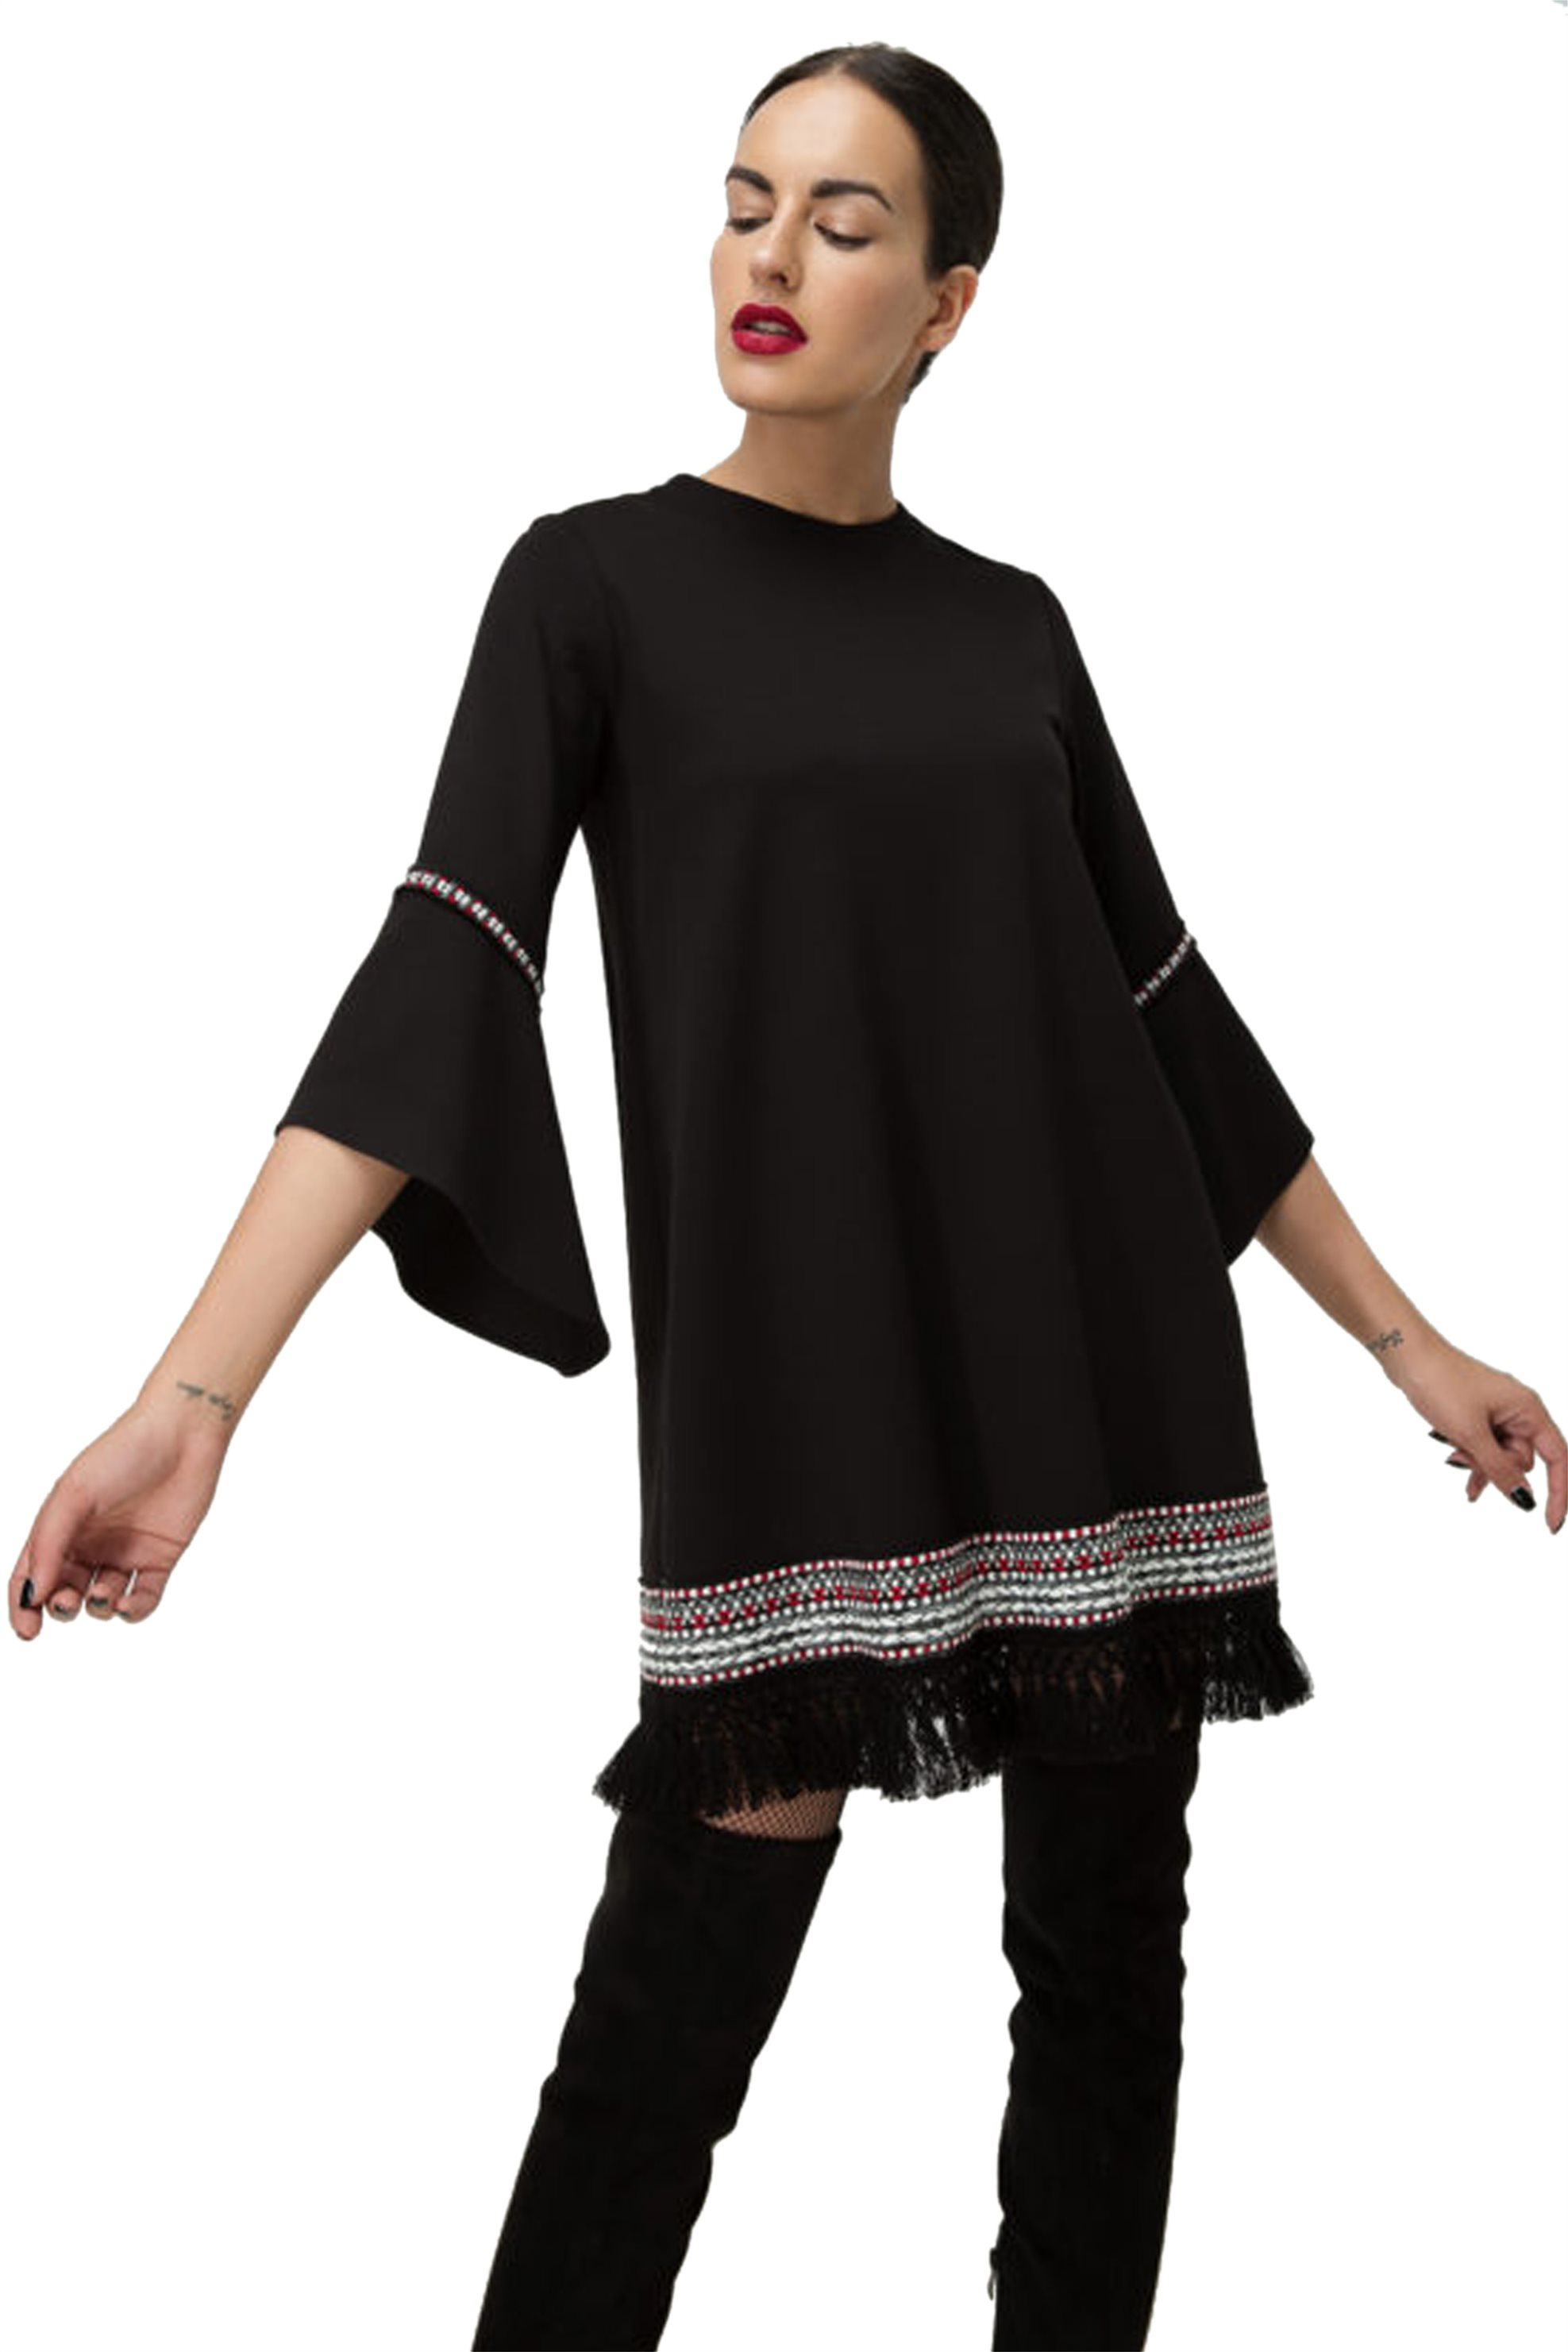 Billy Sabbado γυναικείο μίνι φόρεμα με κεντήματα και κρόσσια - 0137915730 - Μαύρ γυναικα   ρουχα   φορέματα   midi φορέματα